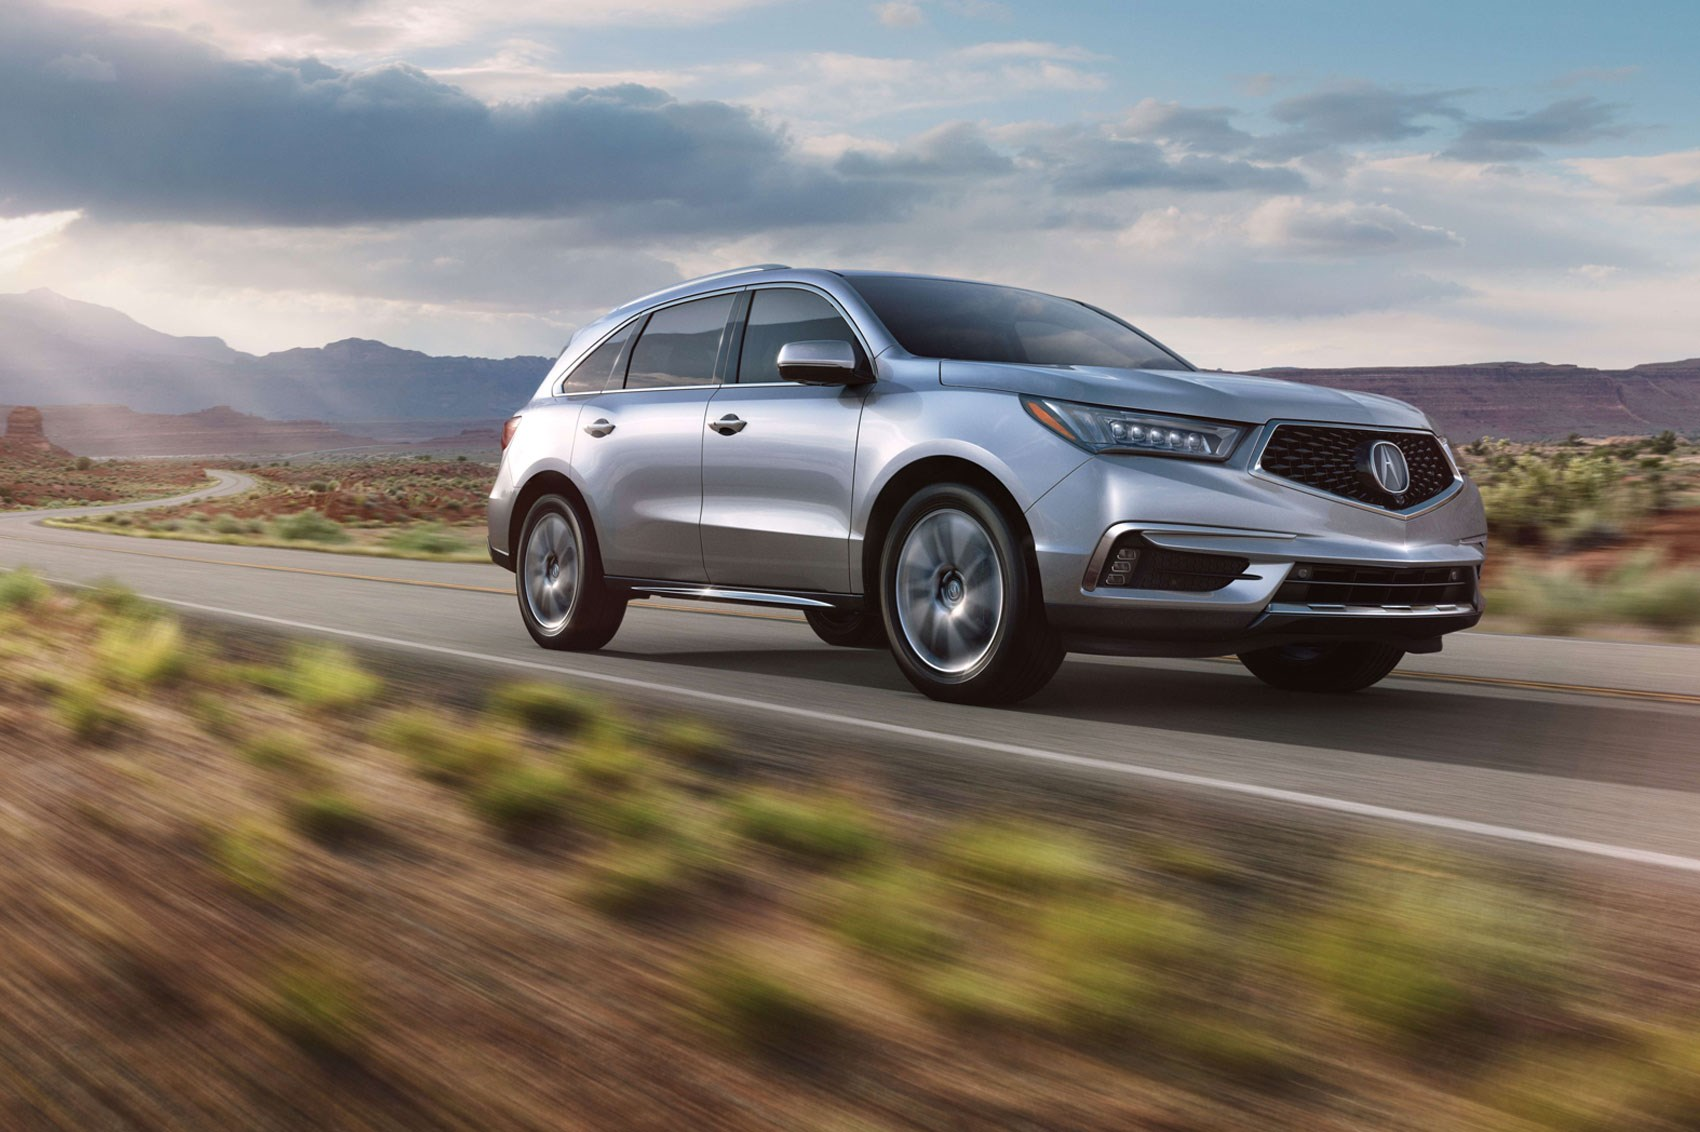 Acura Mdx Sh Awd 2015 Review Car Magazine